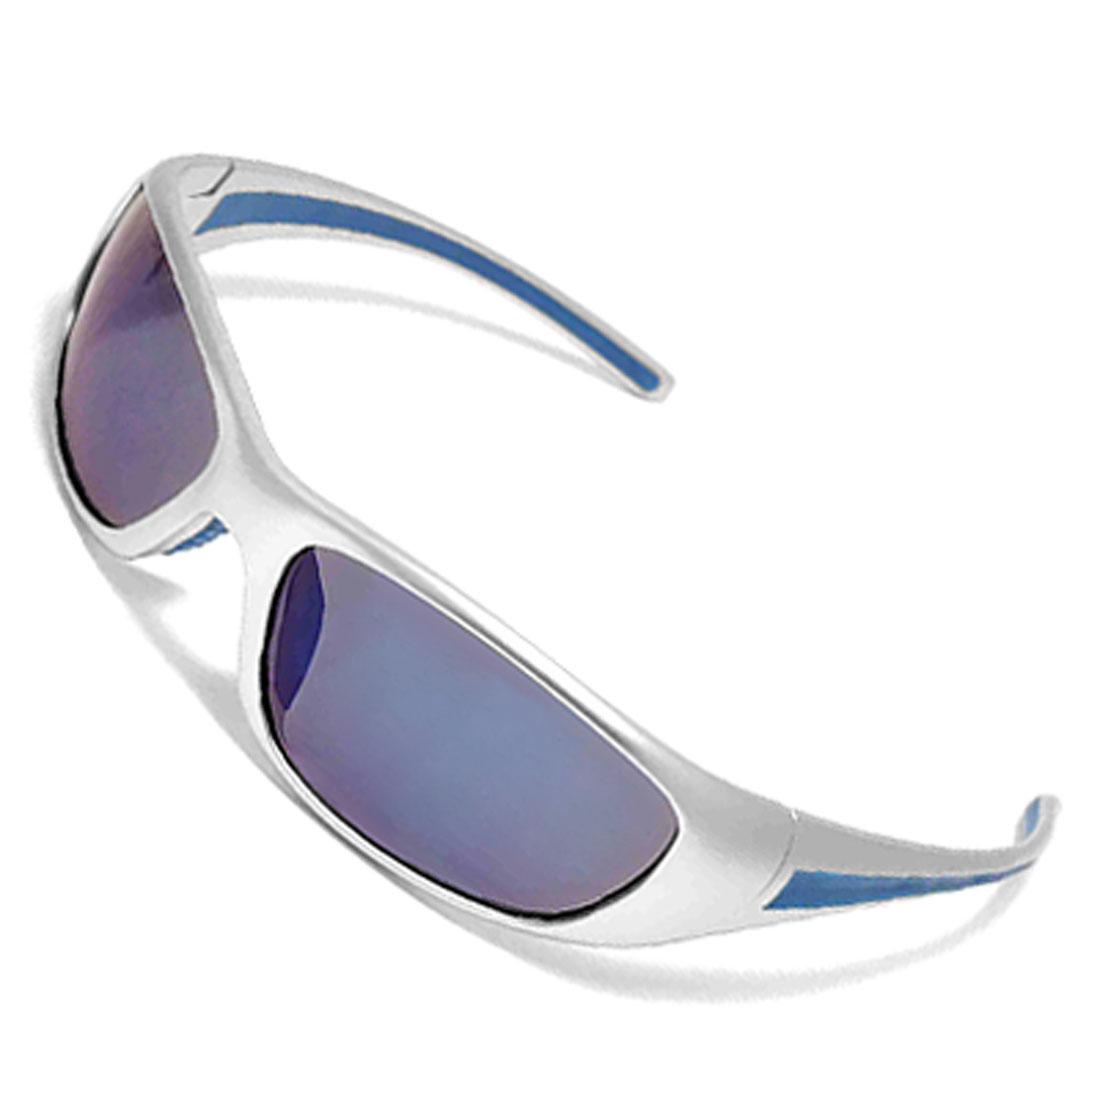 Trendy Ladies' Silvery Plastic Eyewear Full-rim Sunglasses